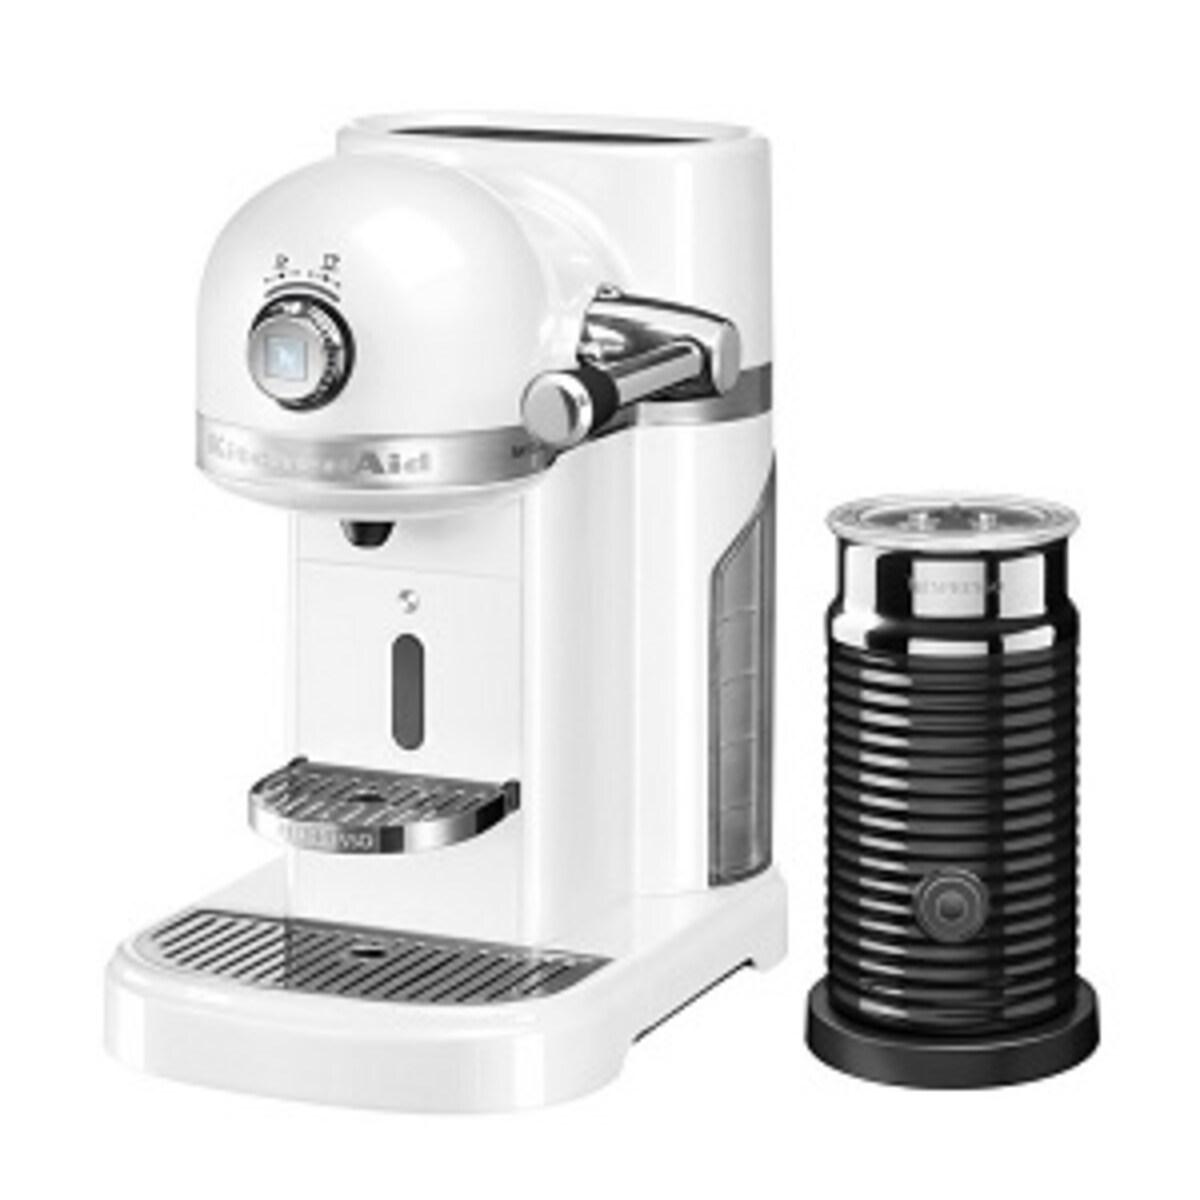 Nespresso Kitchen Aid Frosted Pearl със система за мляко